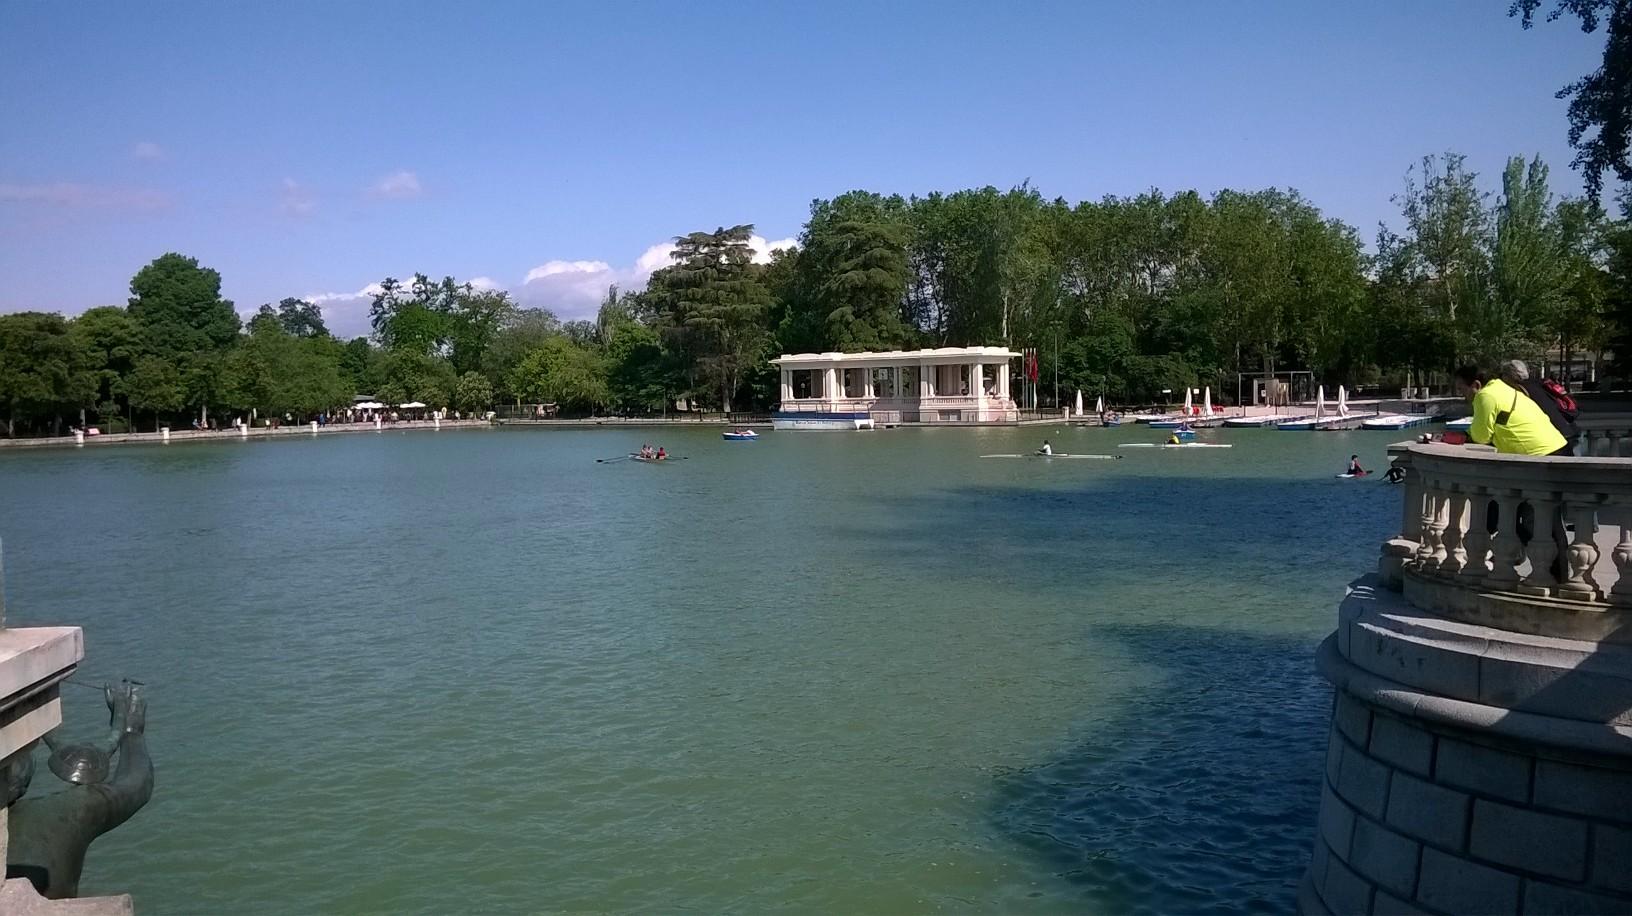 mad-retiro-park-boat-rentals-may16